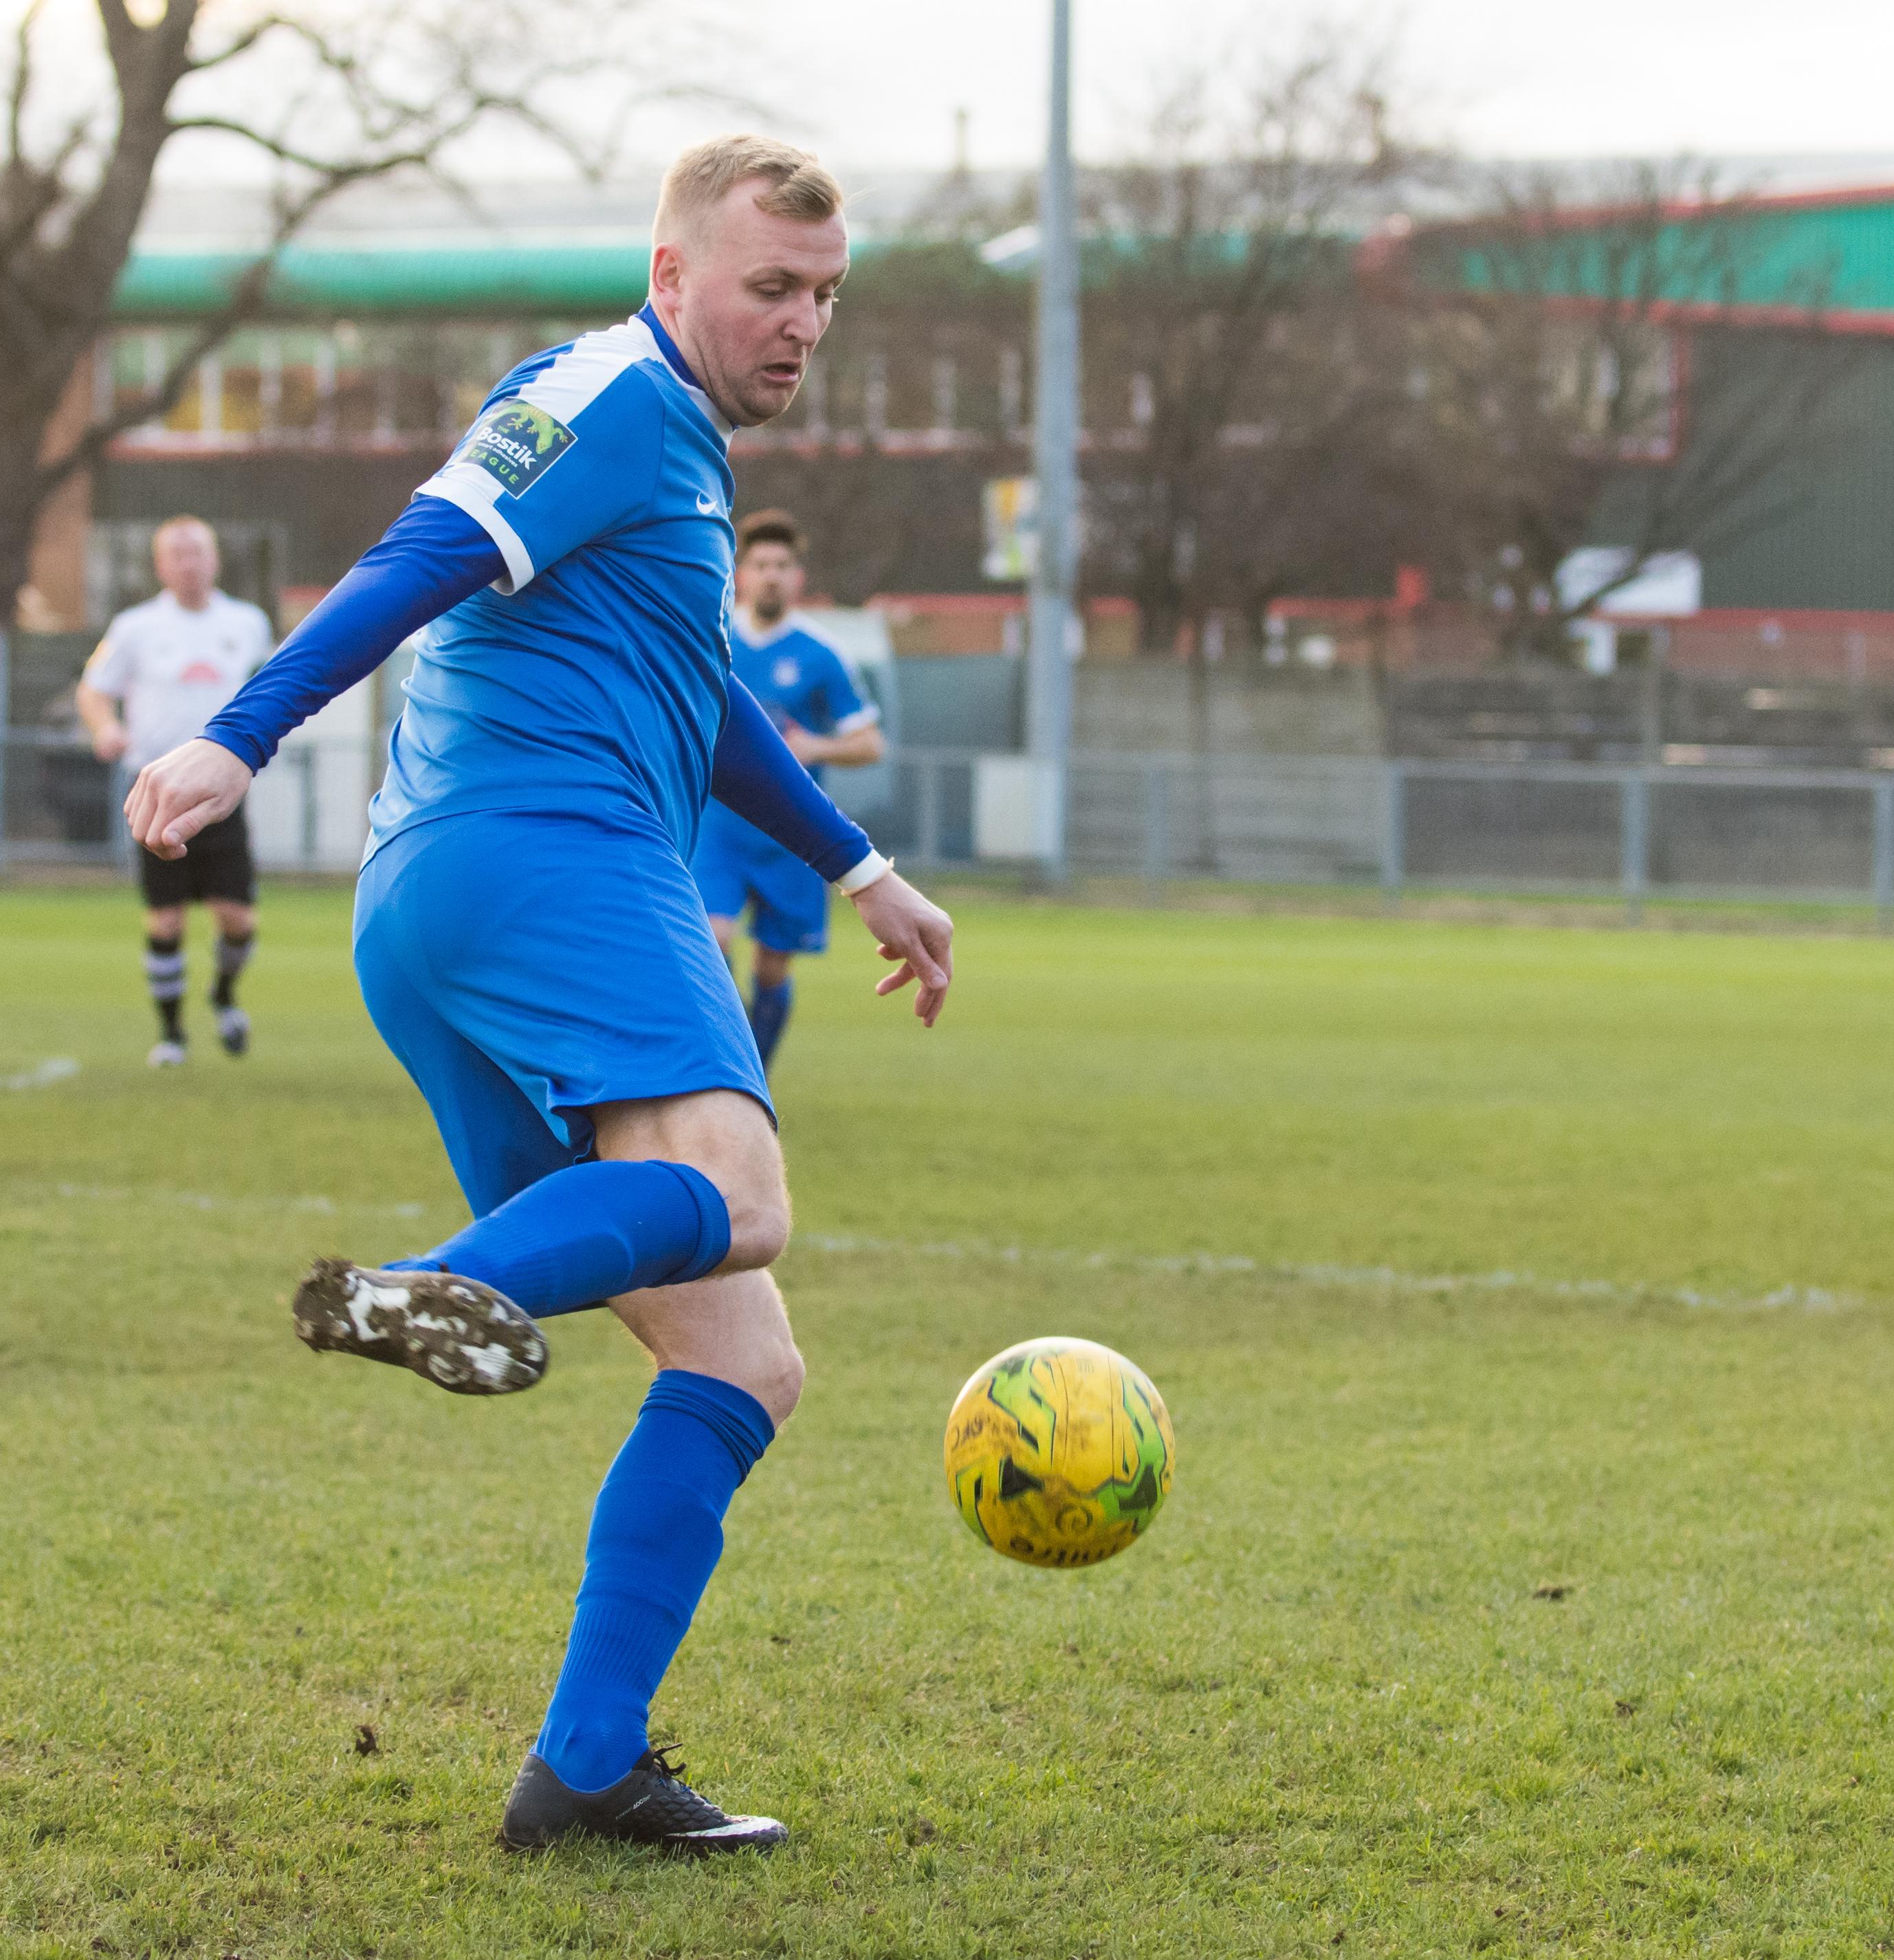 Shoreham FC vs Molesey FC 02.12.17 45